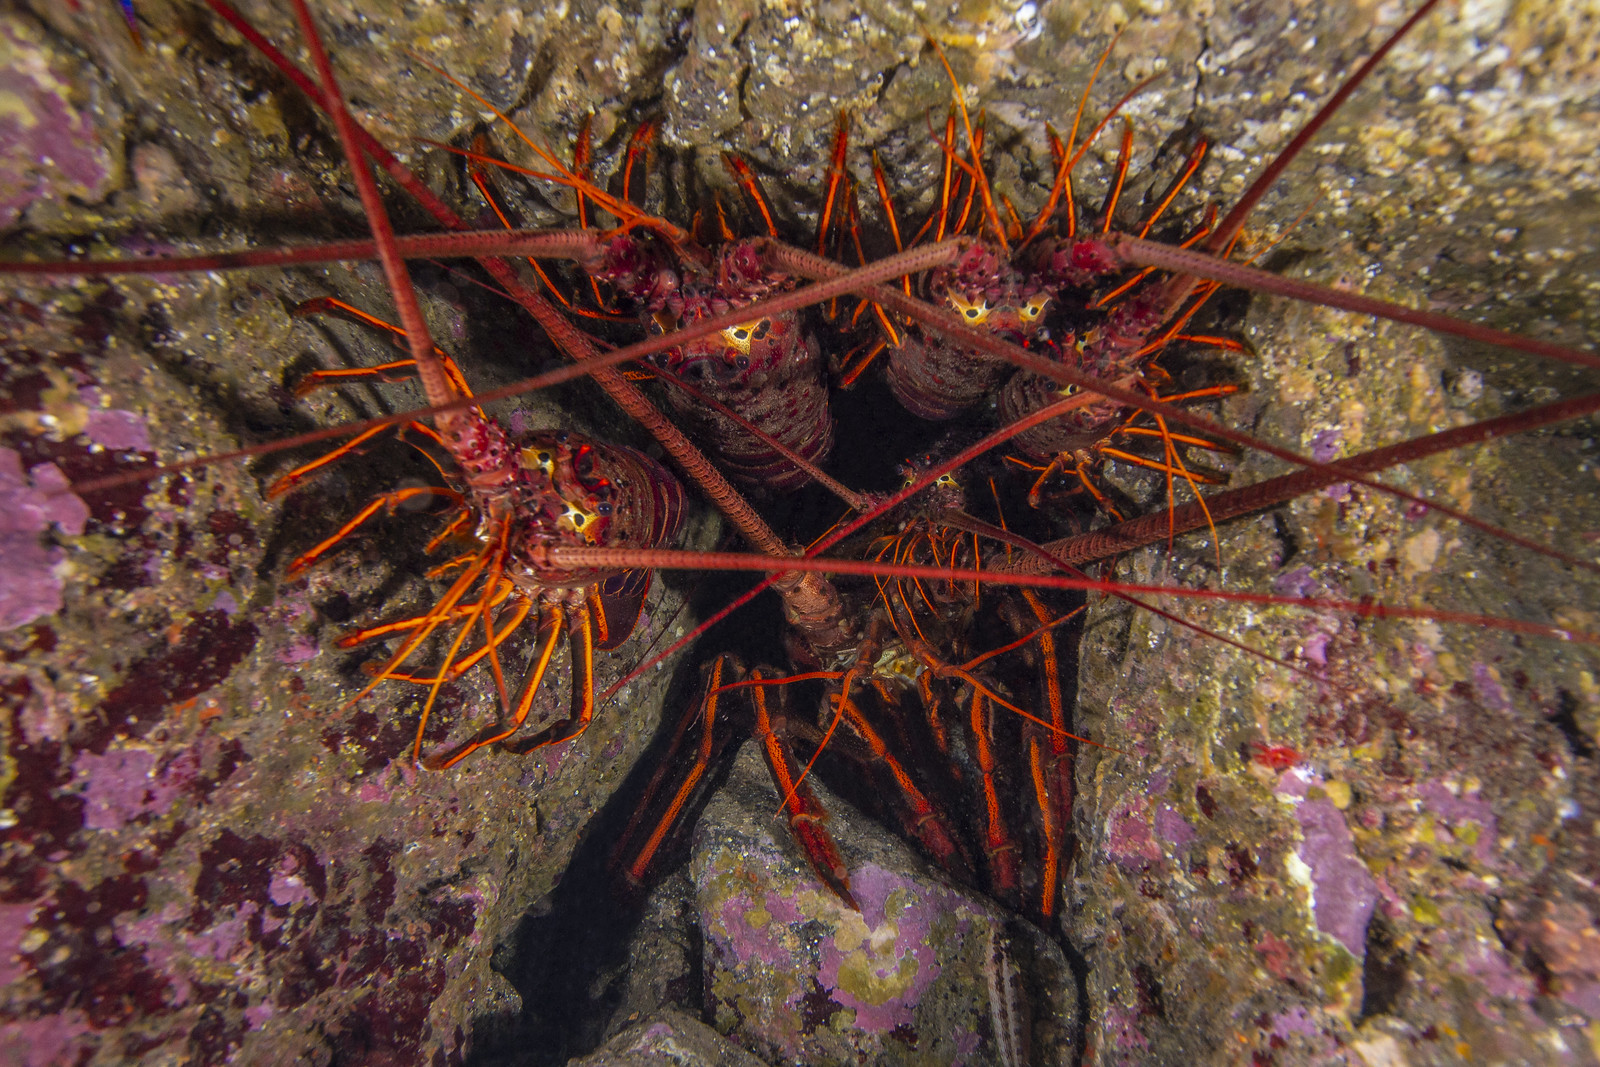 lobsterSept7-18, Canon EOS REBEL T4I, Canon EF-S 10-22mm f/3.5-4.5 USM